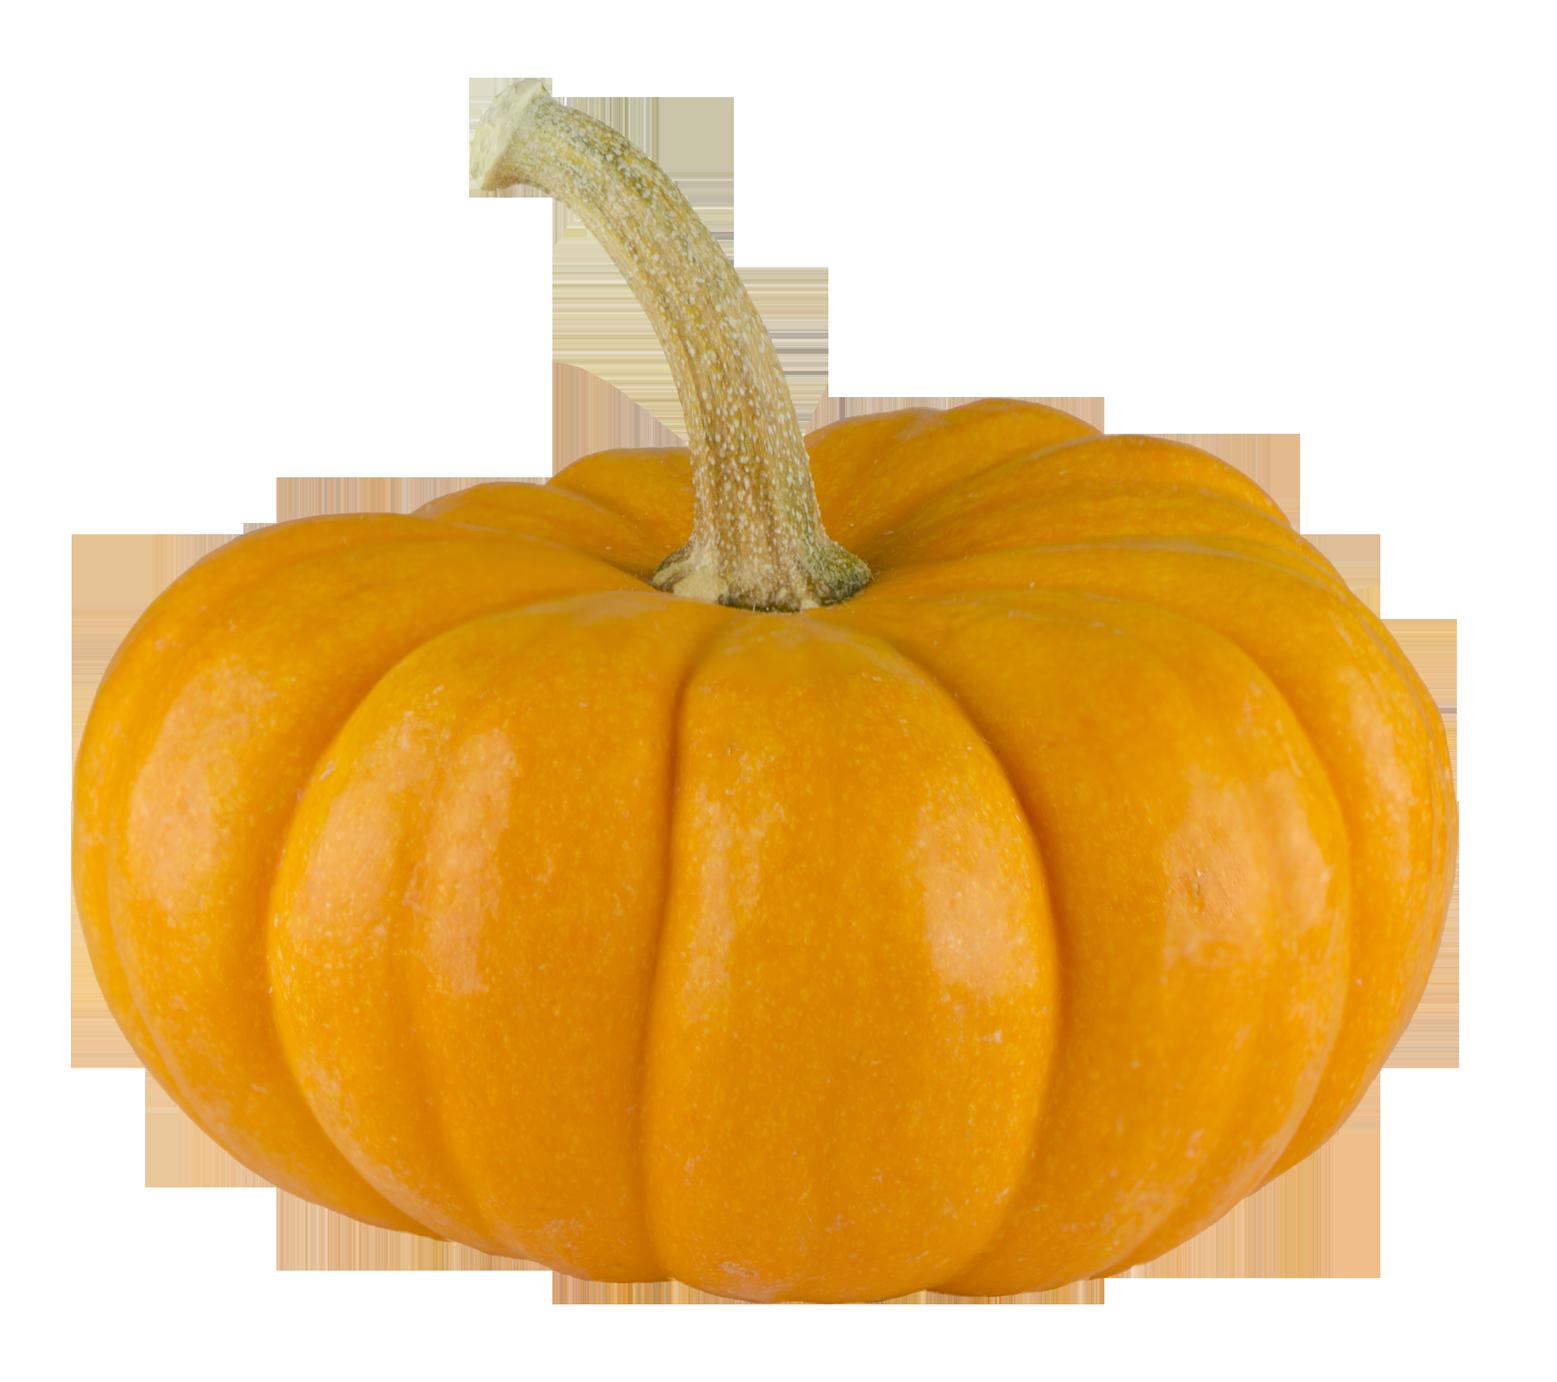 Zucchini clipart transparent background. Pumpkin png image purepng